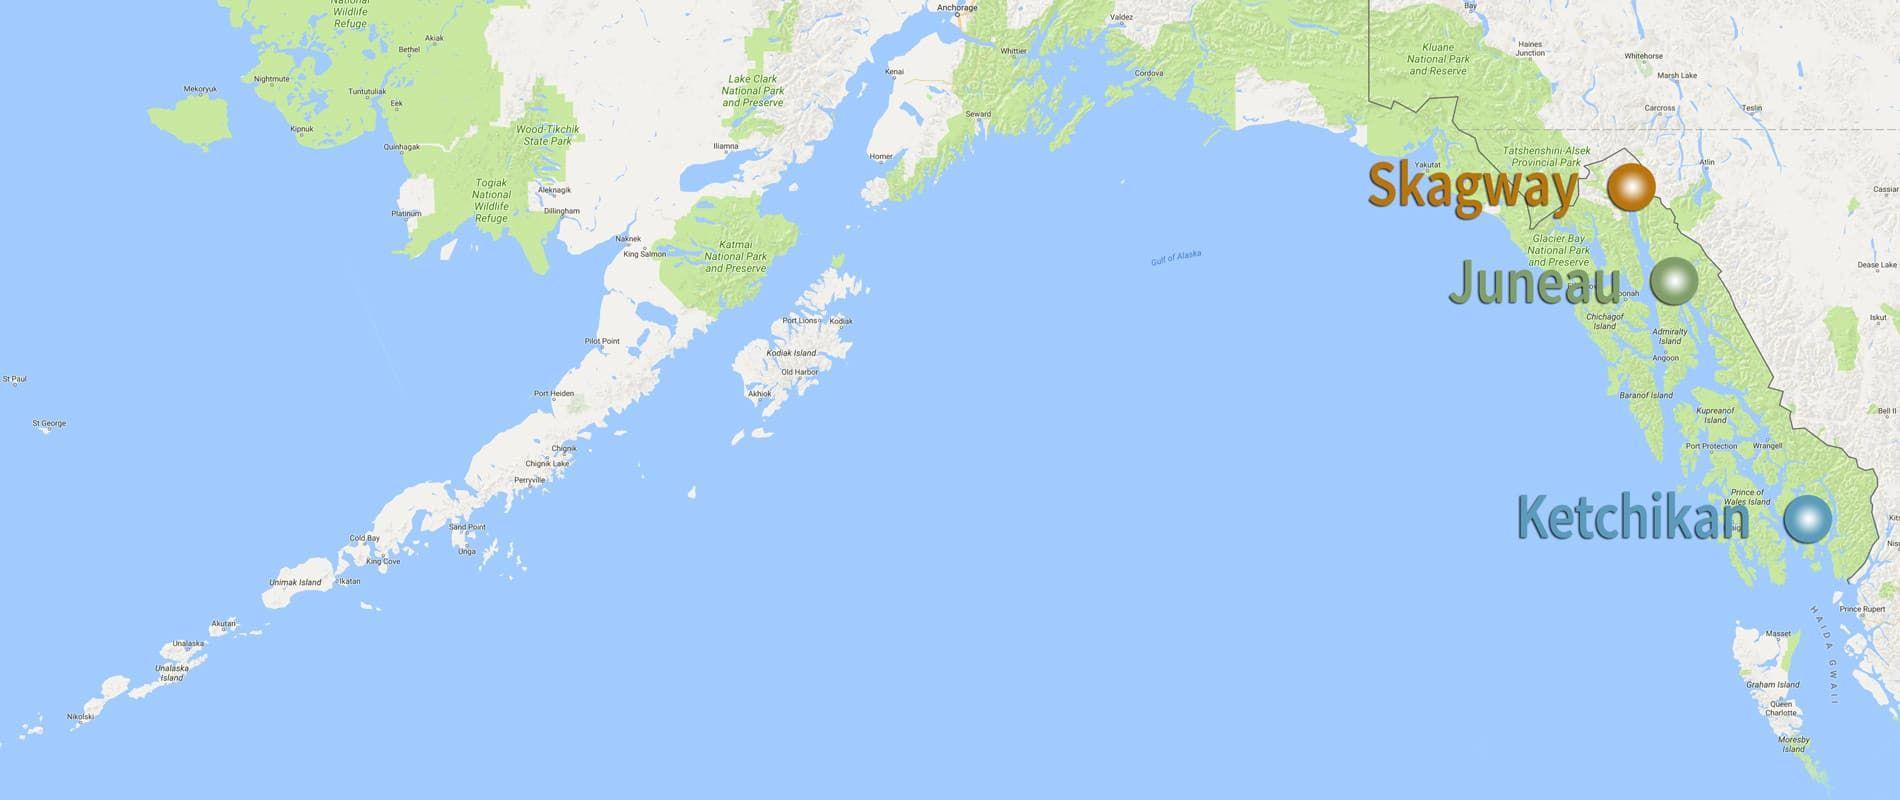 Juneau, Skagway, and Ketchikan Alaska Map and Walking Guide ... on ketchikan walking map, wasilla map, ketchikan alaska map, glacier bay alaska map, white pass alaska map, dawson city alaska map, whittier alaska map, palmer alaska map, tracy arm alaska map, sitka alaska map, dutch harbor alaska map, seward alaska map, juno alaska map, nulato alaska map, victoria bc map, hubbard glacier map, juneau map, unalakleet alaska map, kenai alaska map, north pole map,